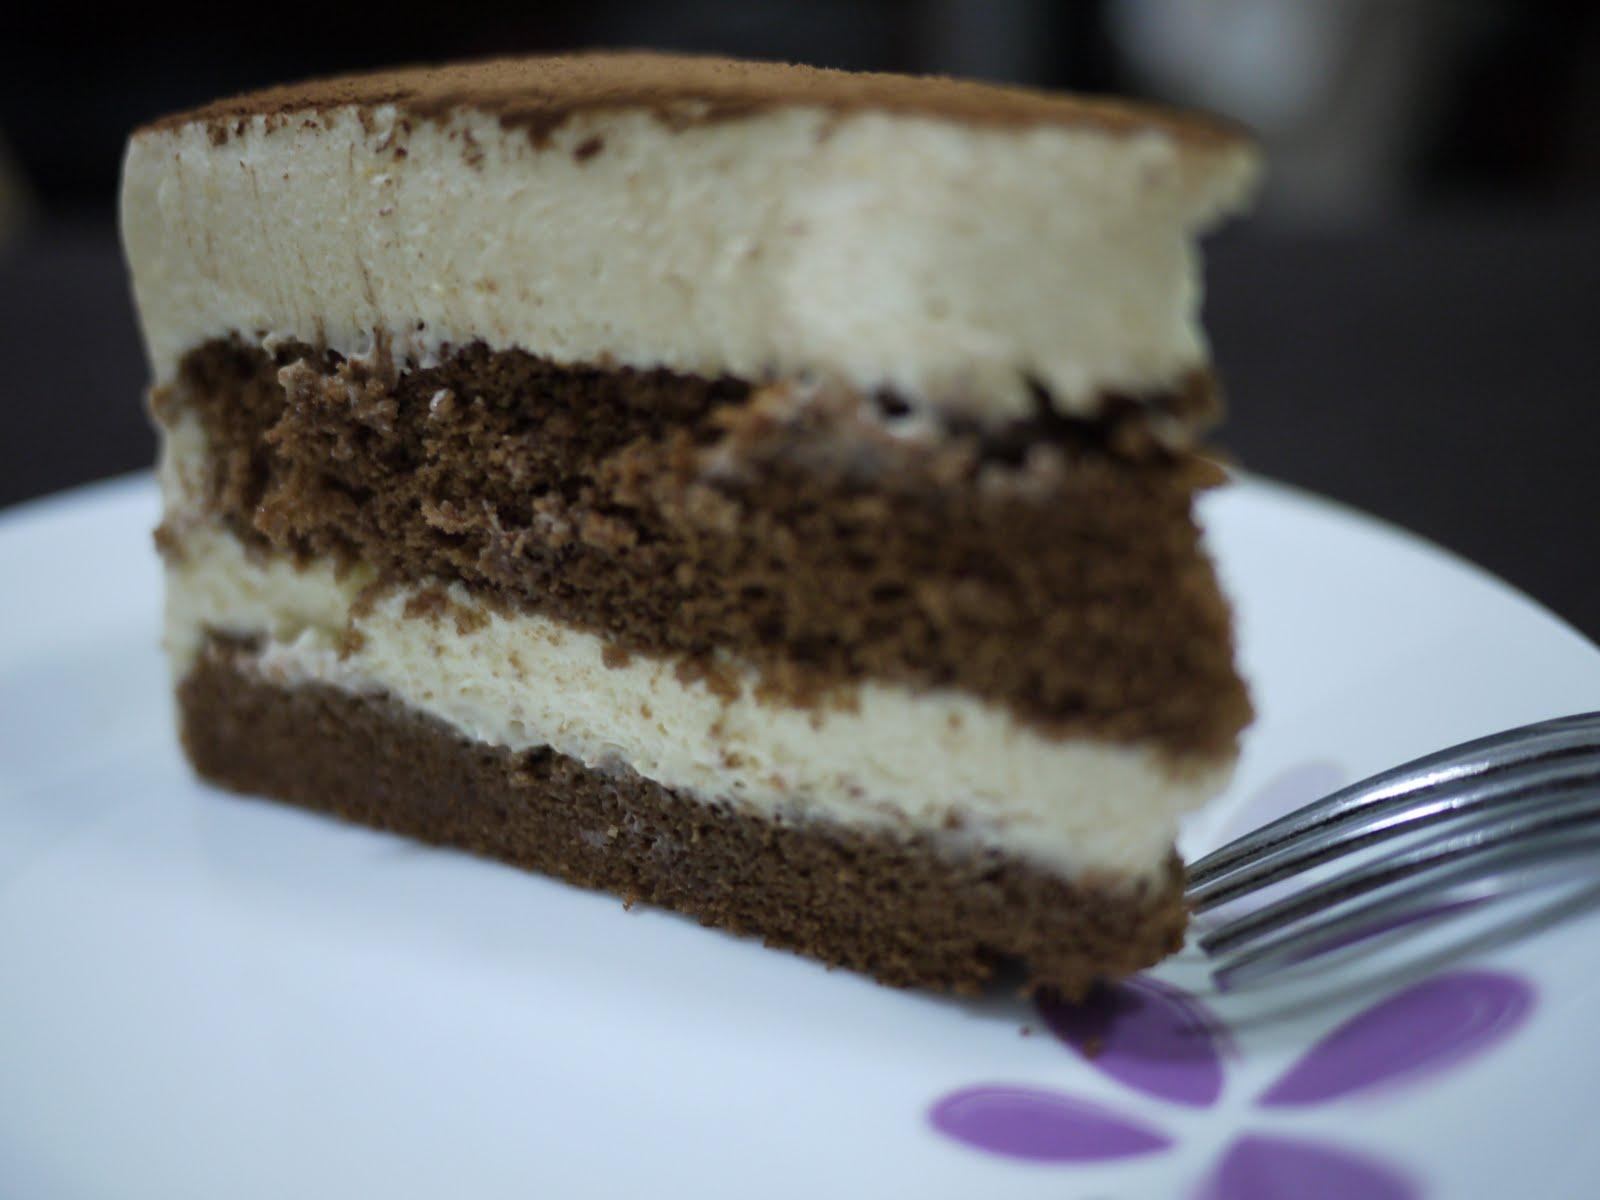 neeble neeble: Tiramisu layer cake